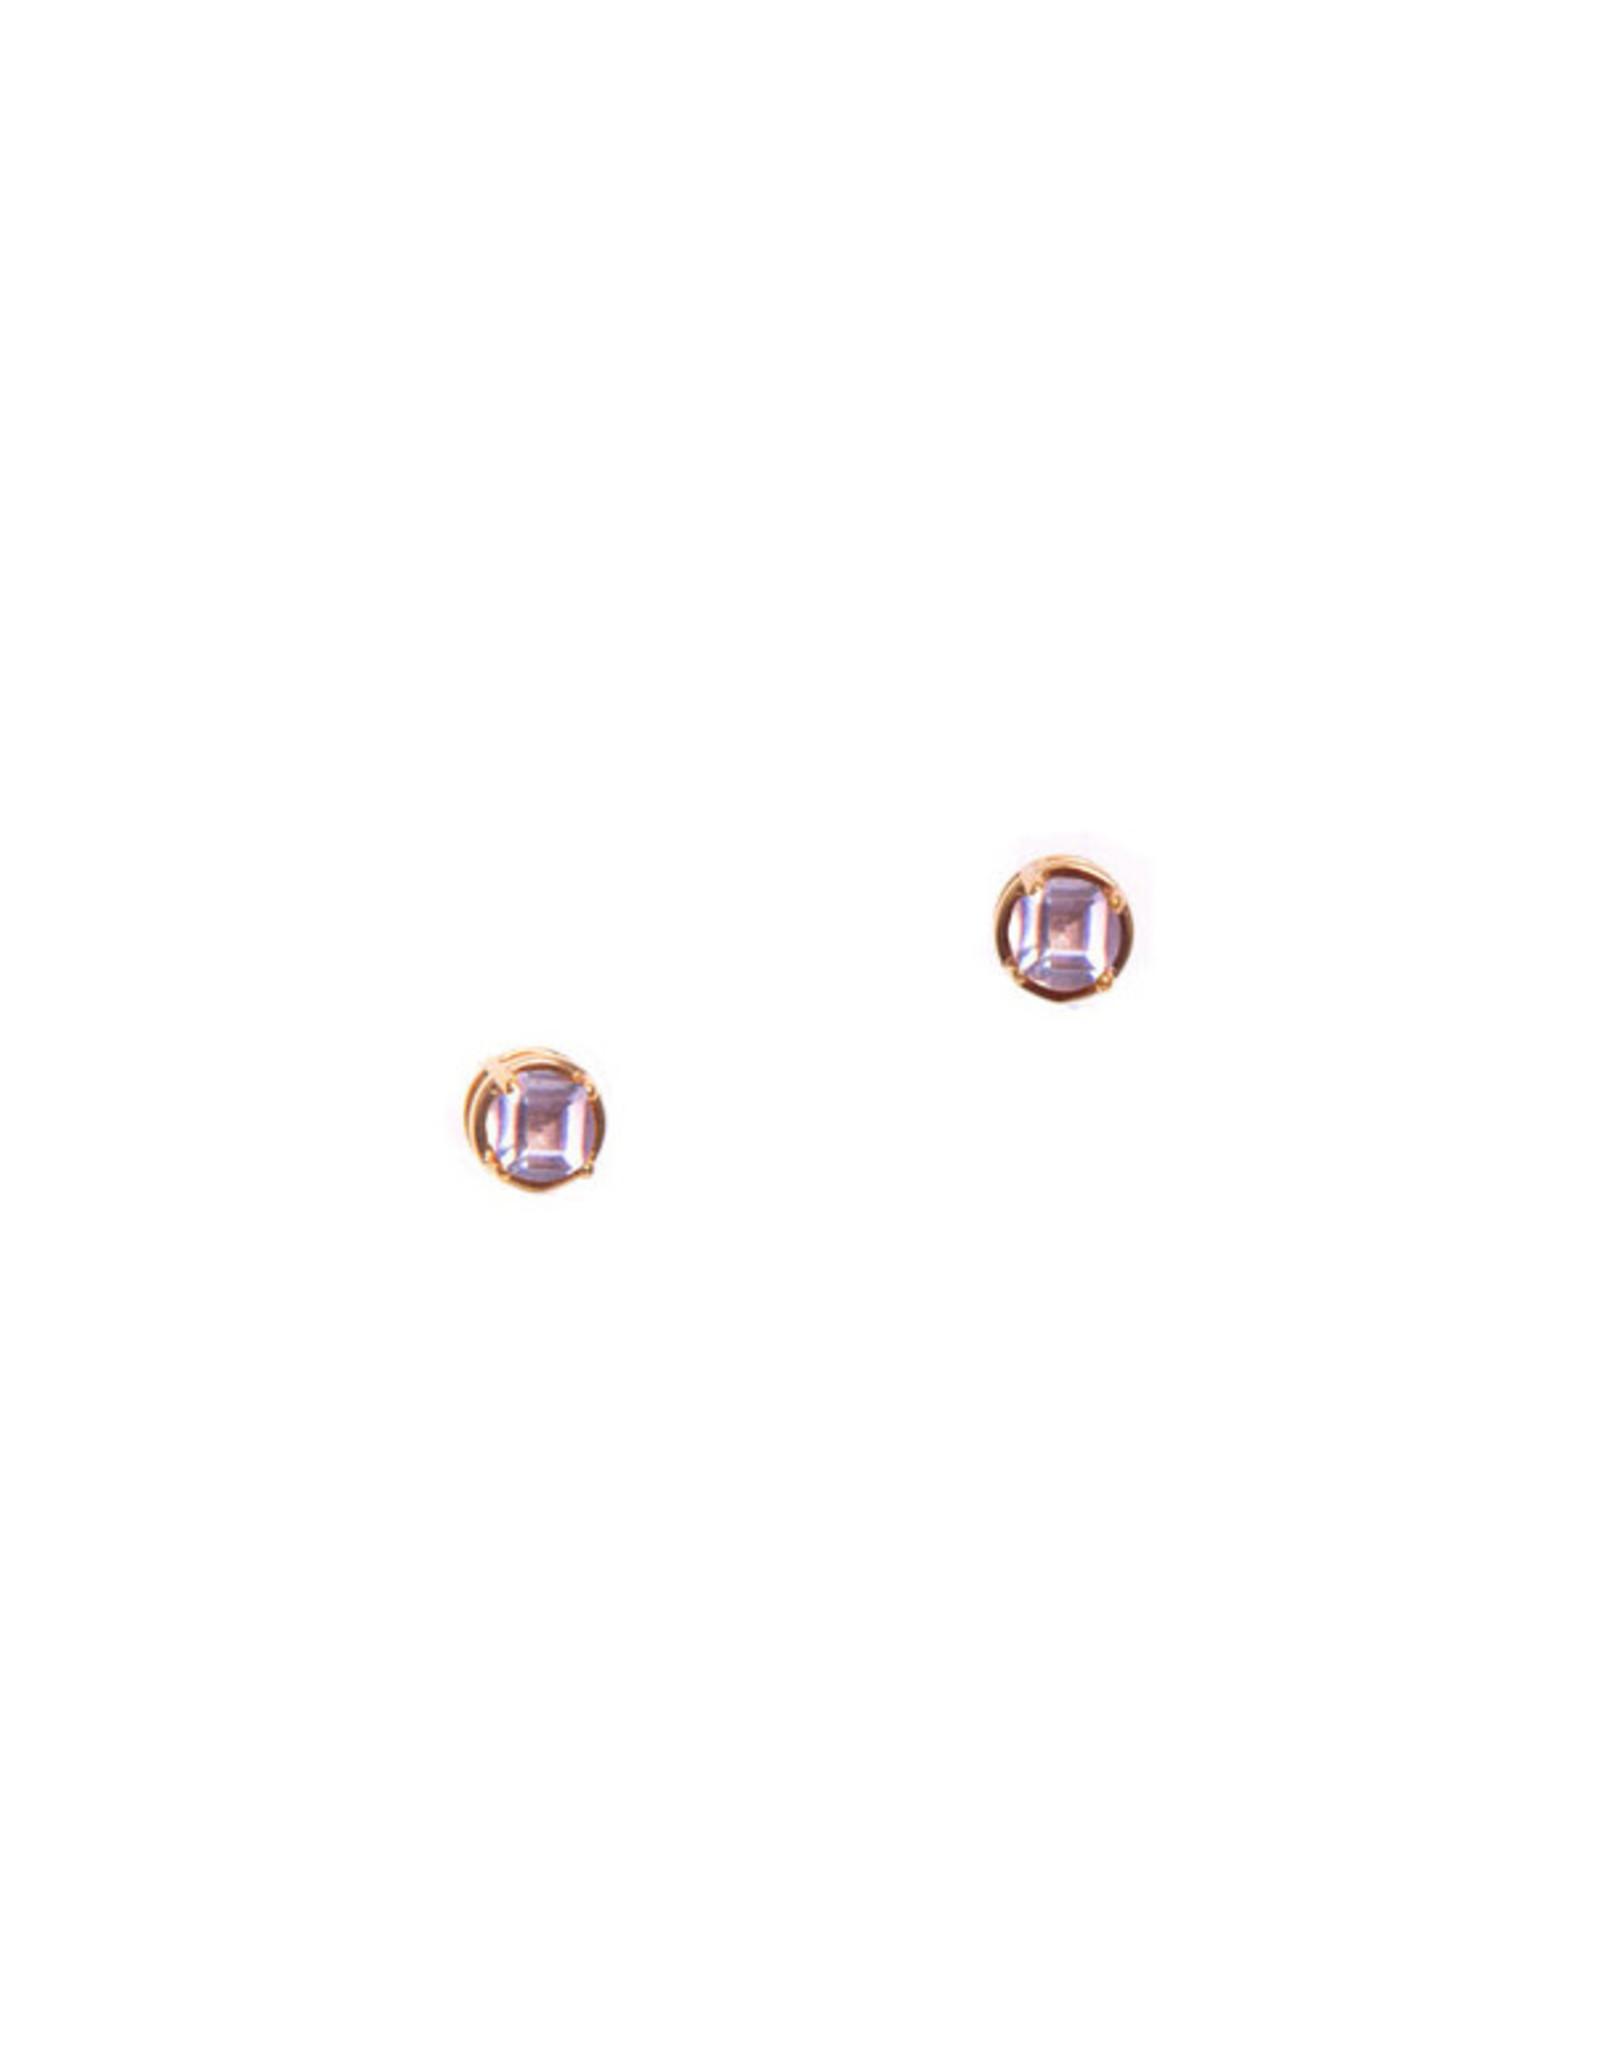 Hailey Gerrits Designs Stone Studs - Pink Amethyst